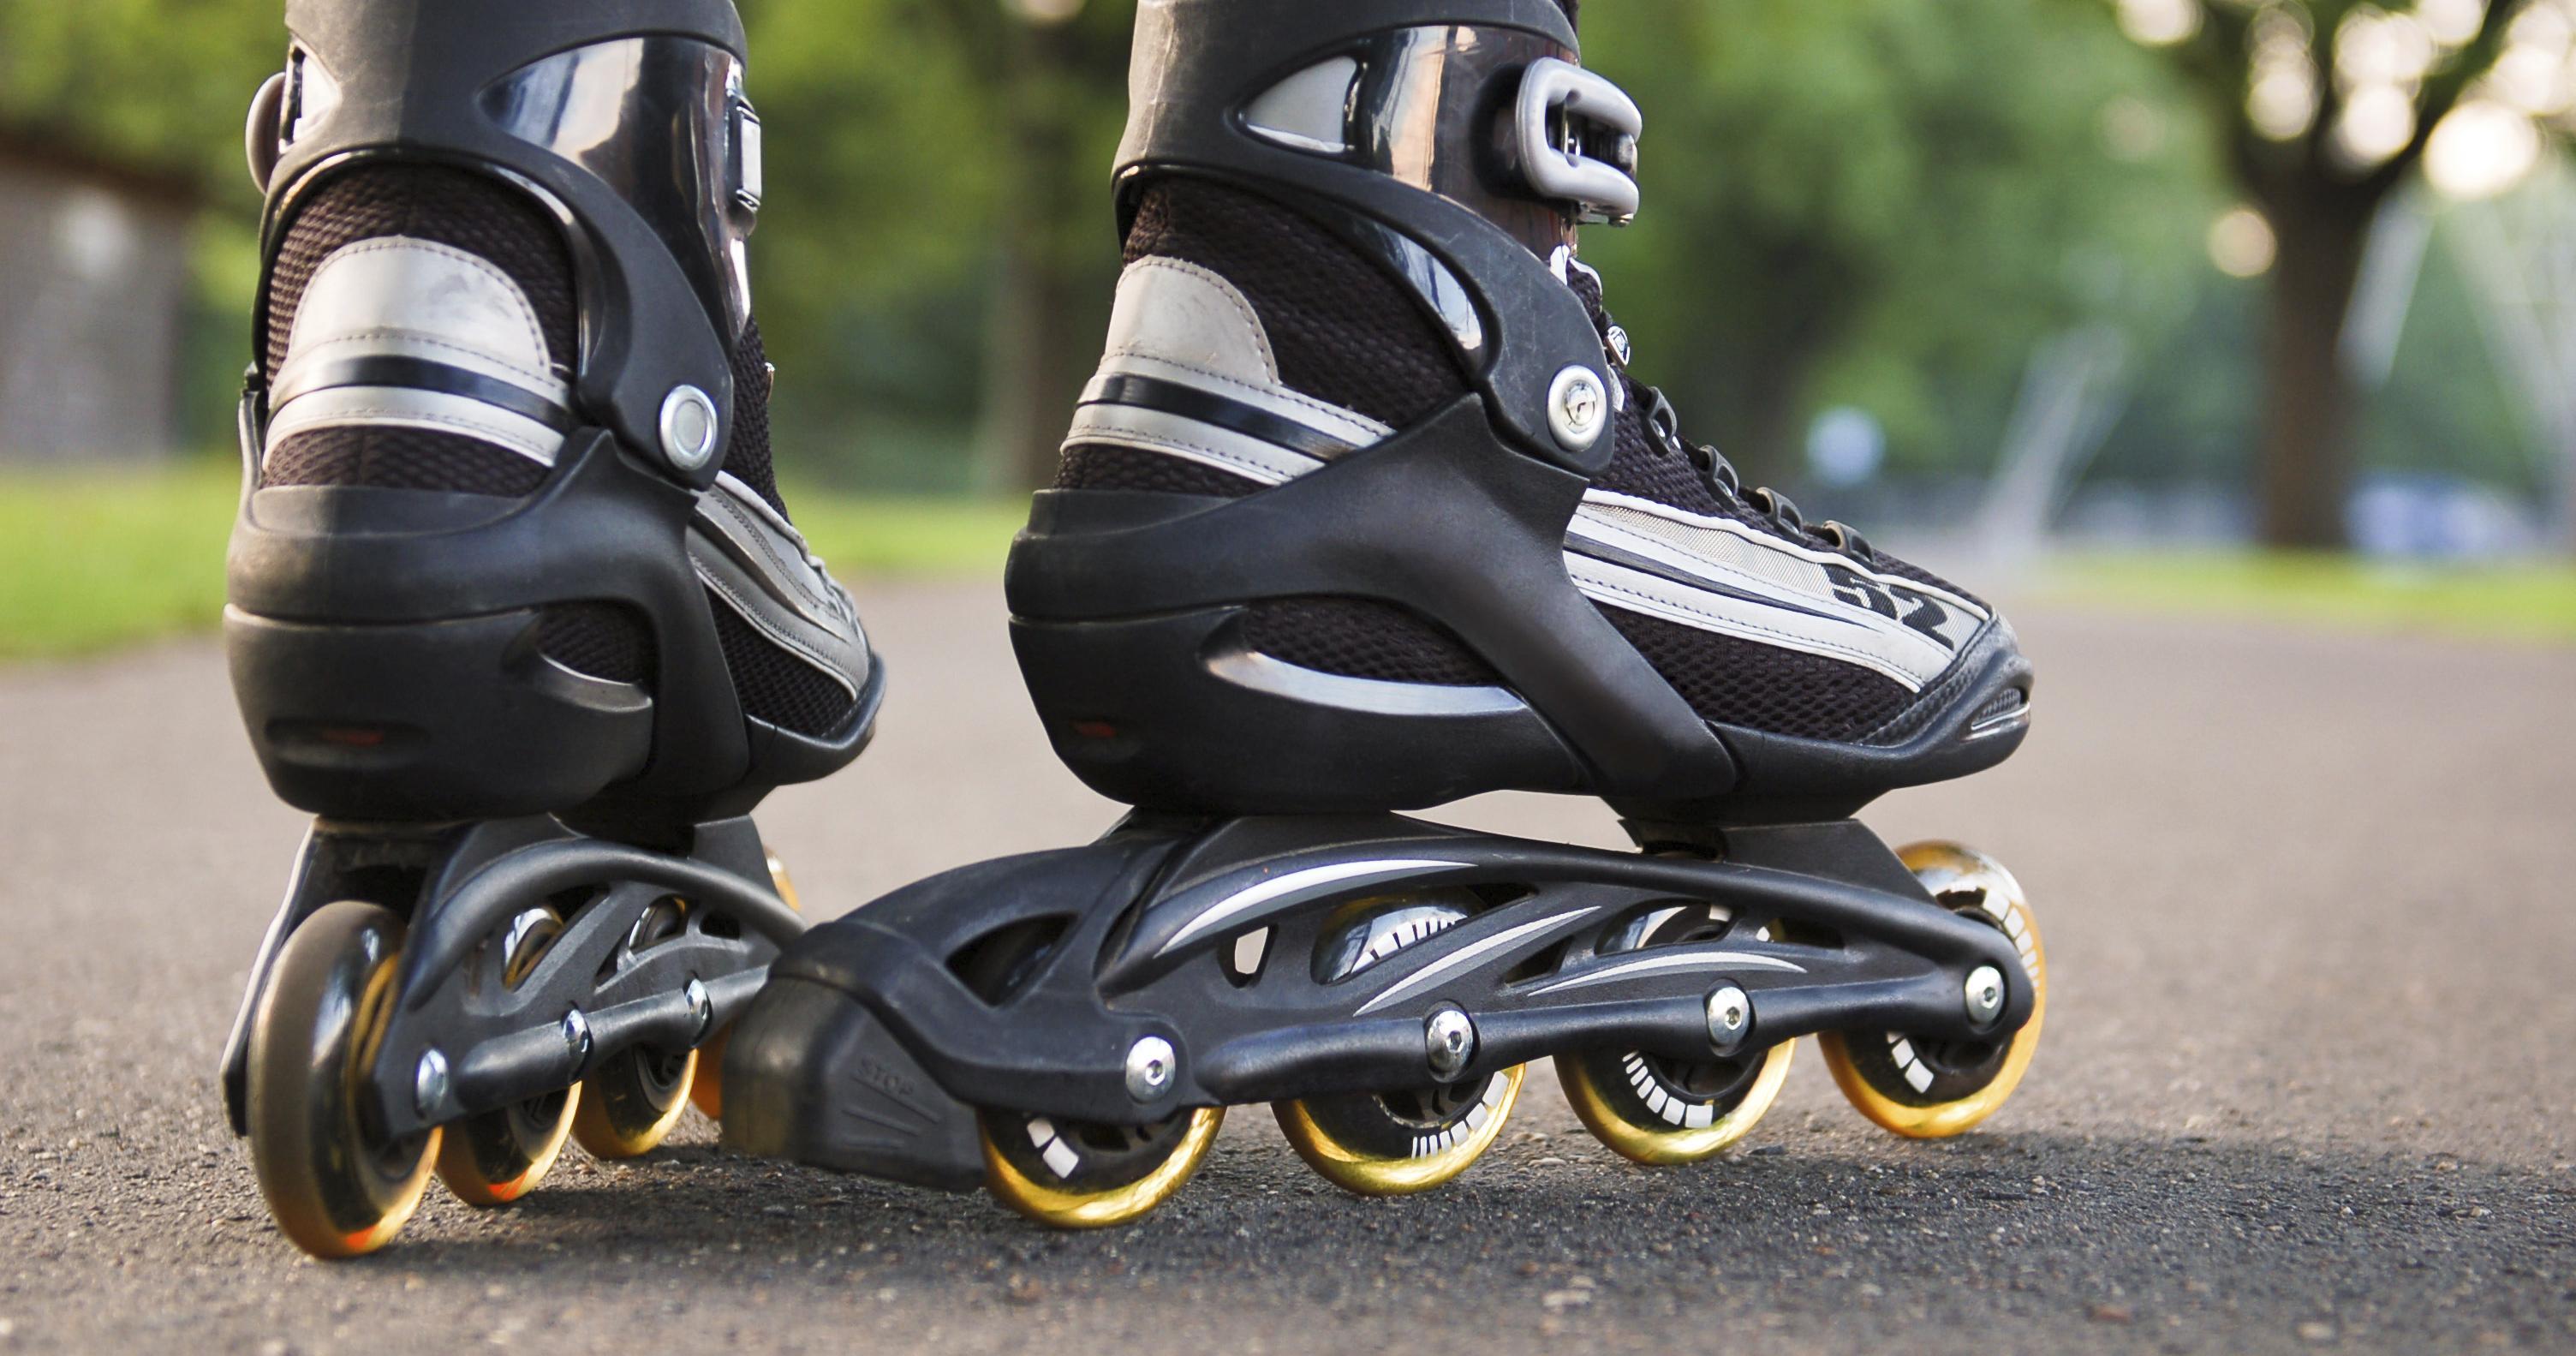 inline-skater-skating-19to1